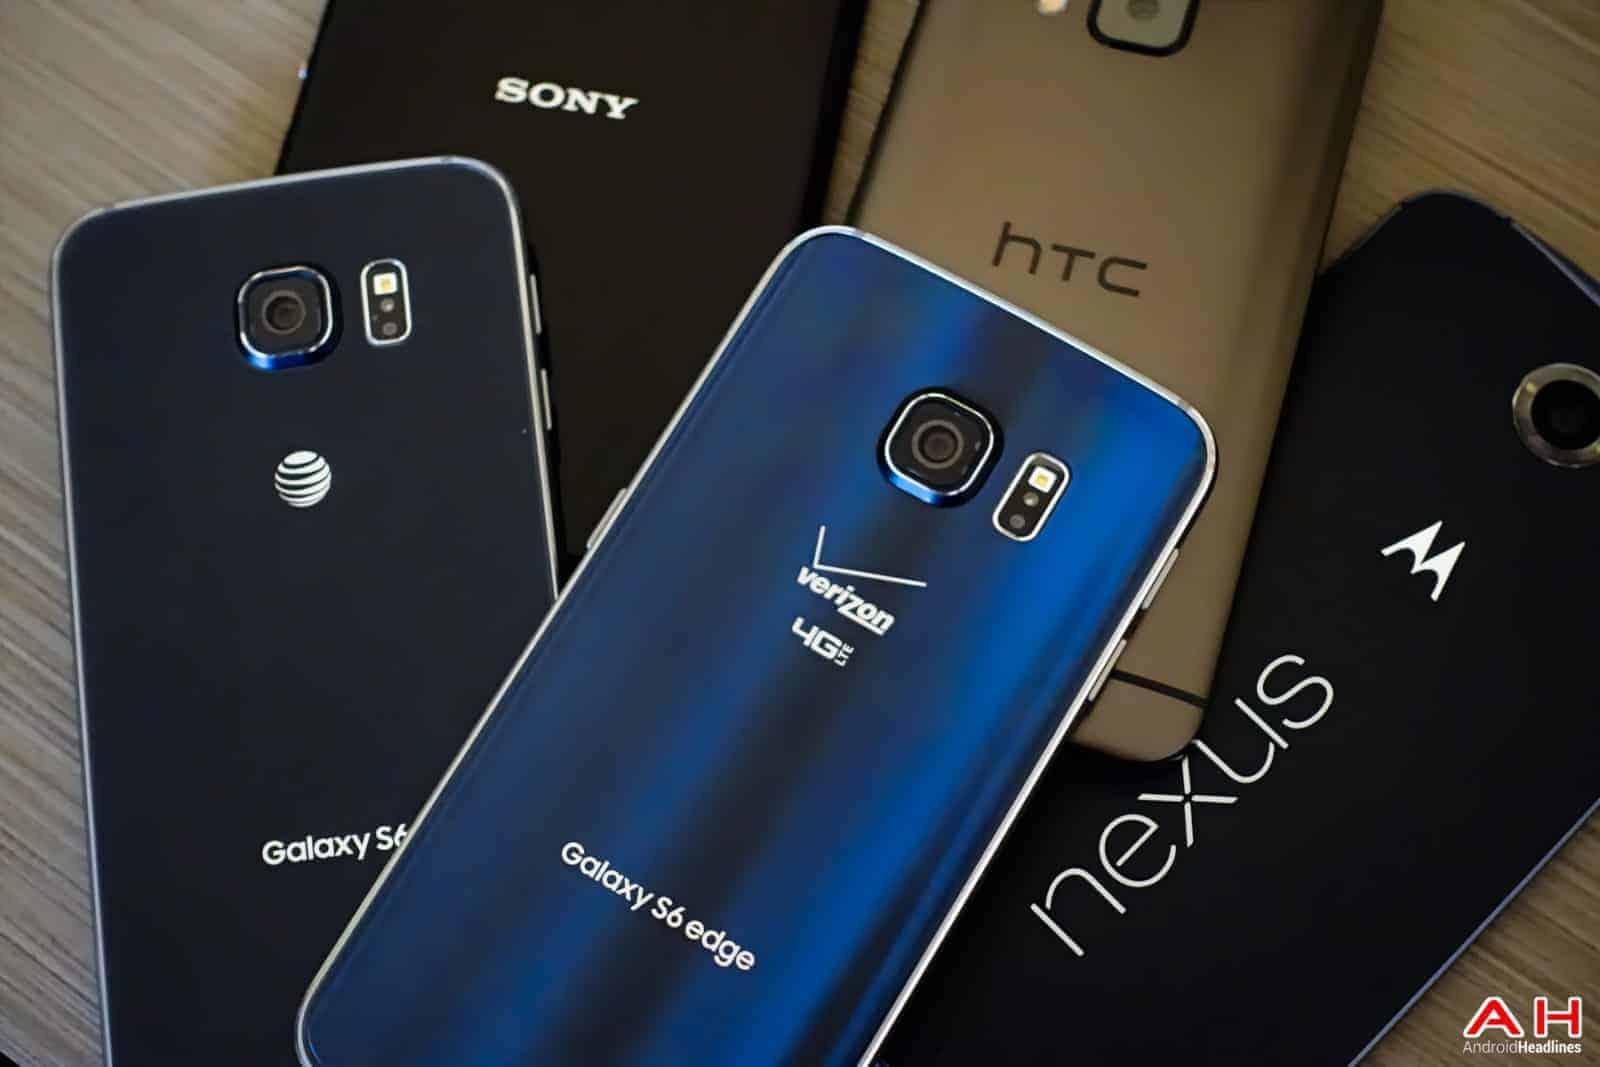 AH Android Samrtphones Nexus Samsung Galaxy S6 HTC One M9 Sony OEM logos-22